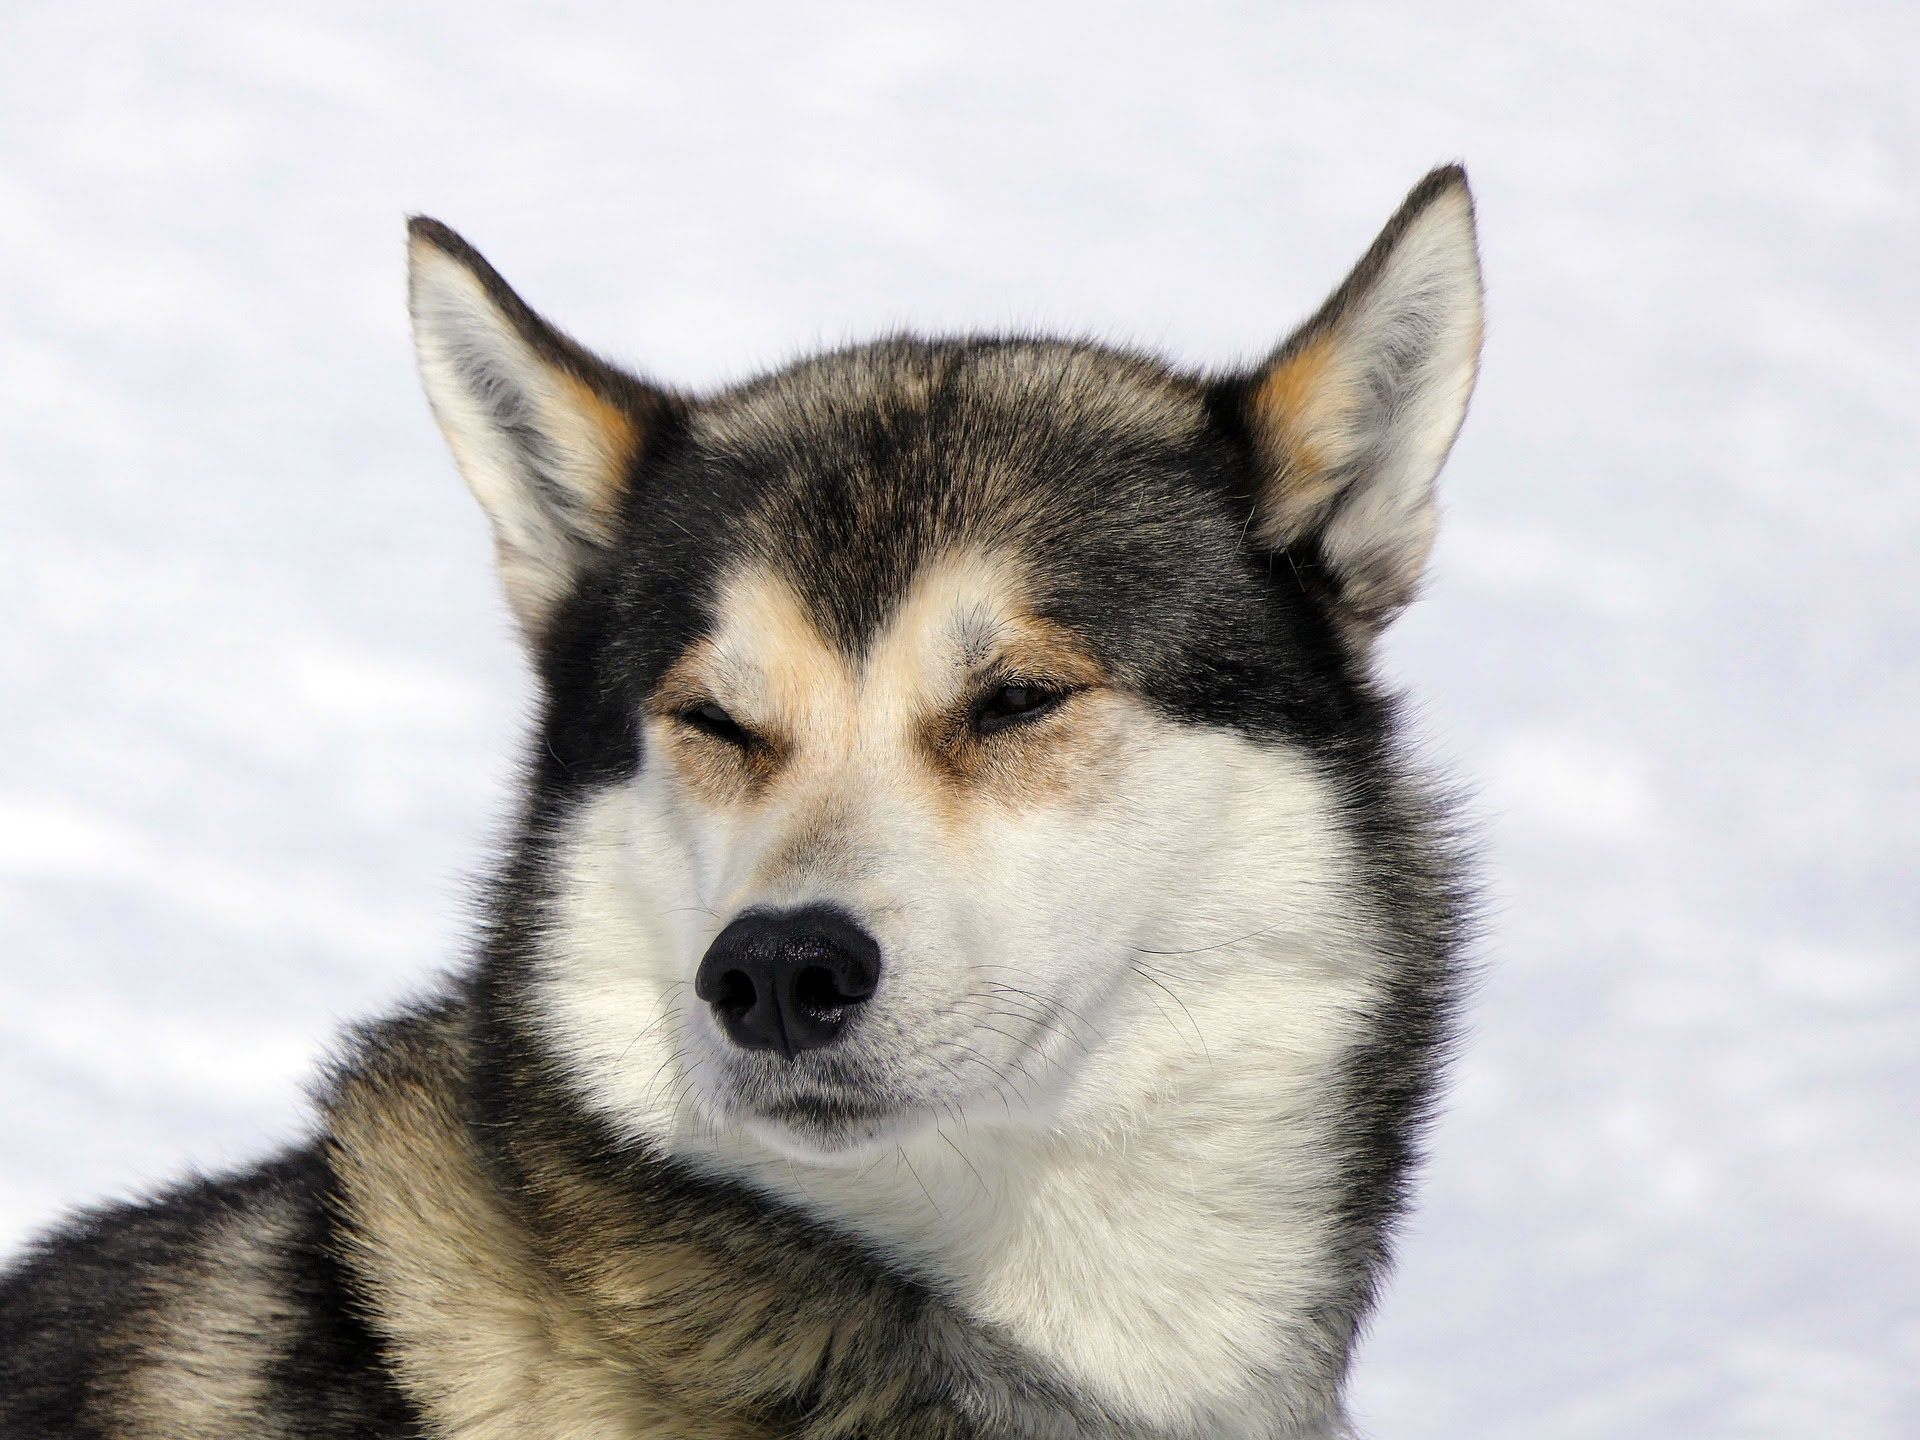 Huskey dog squinting